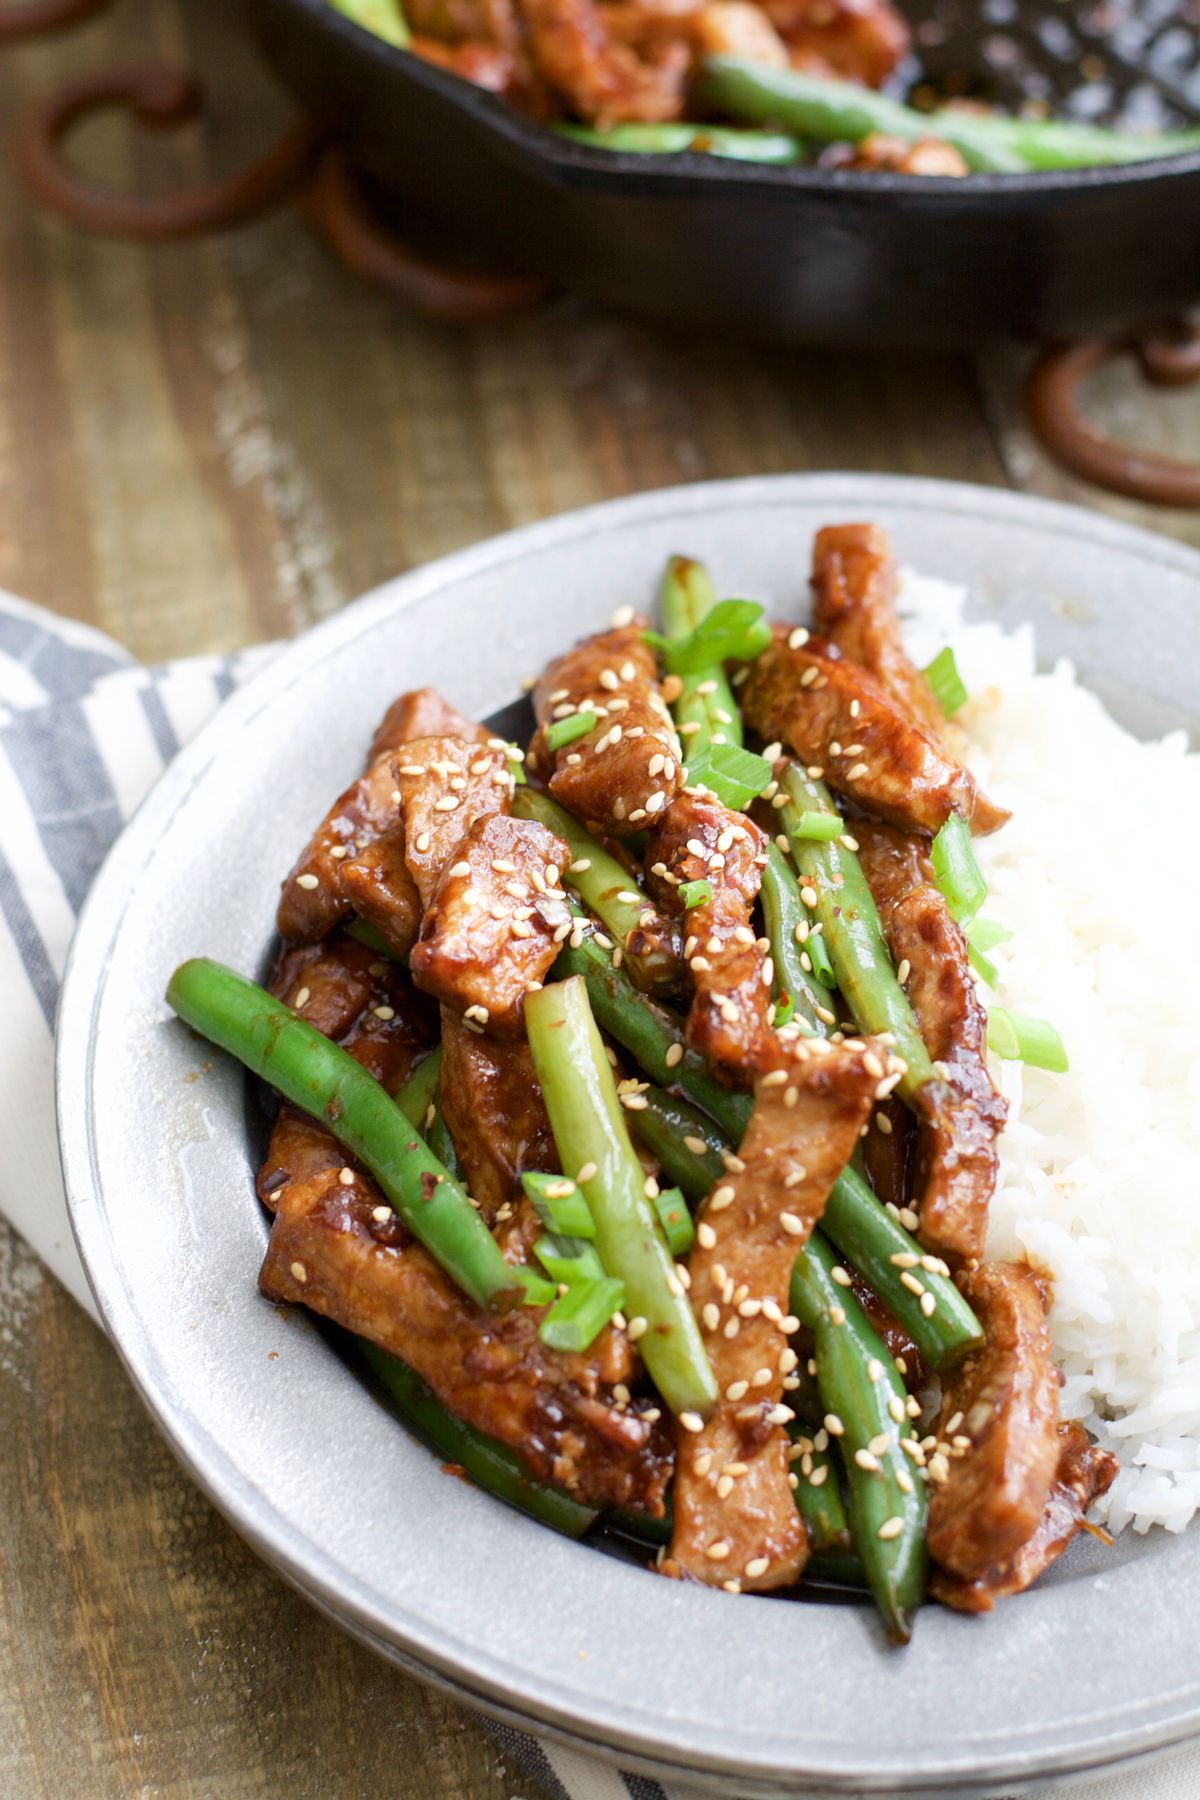 A plate of rice and sesame pork stir fry.